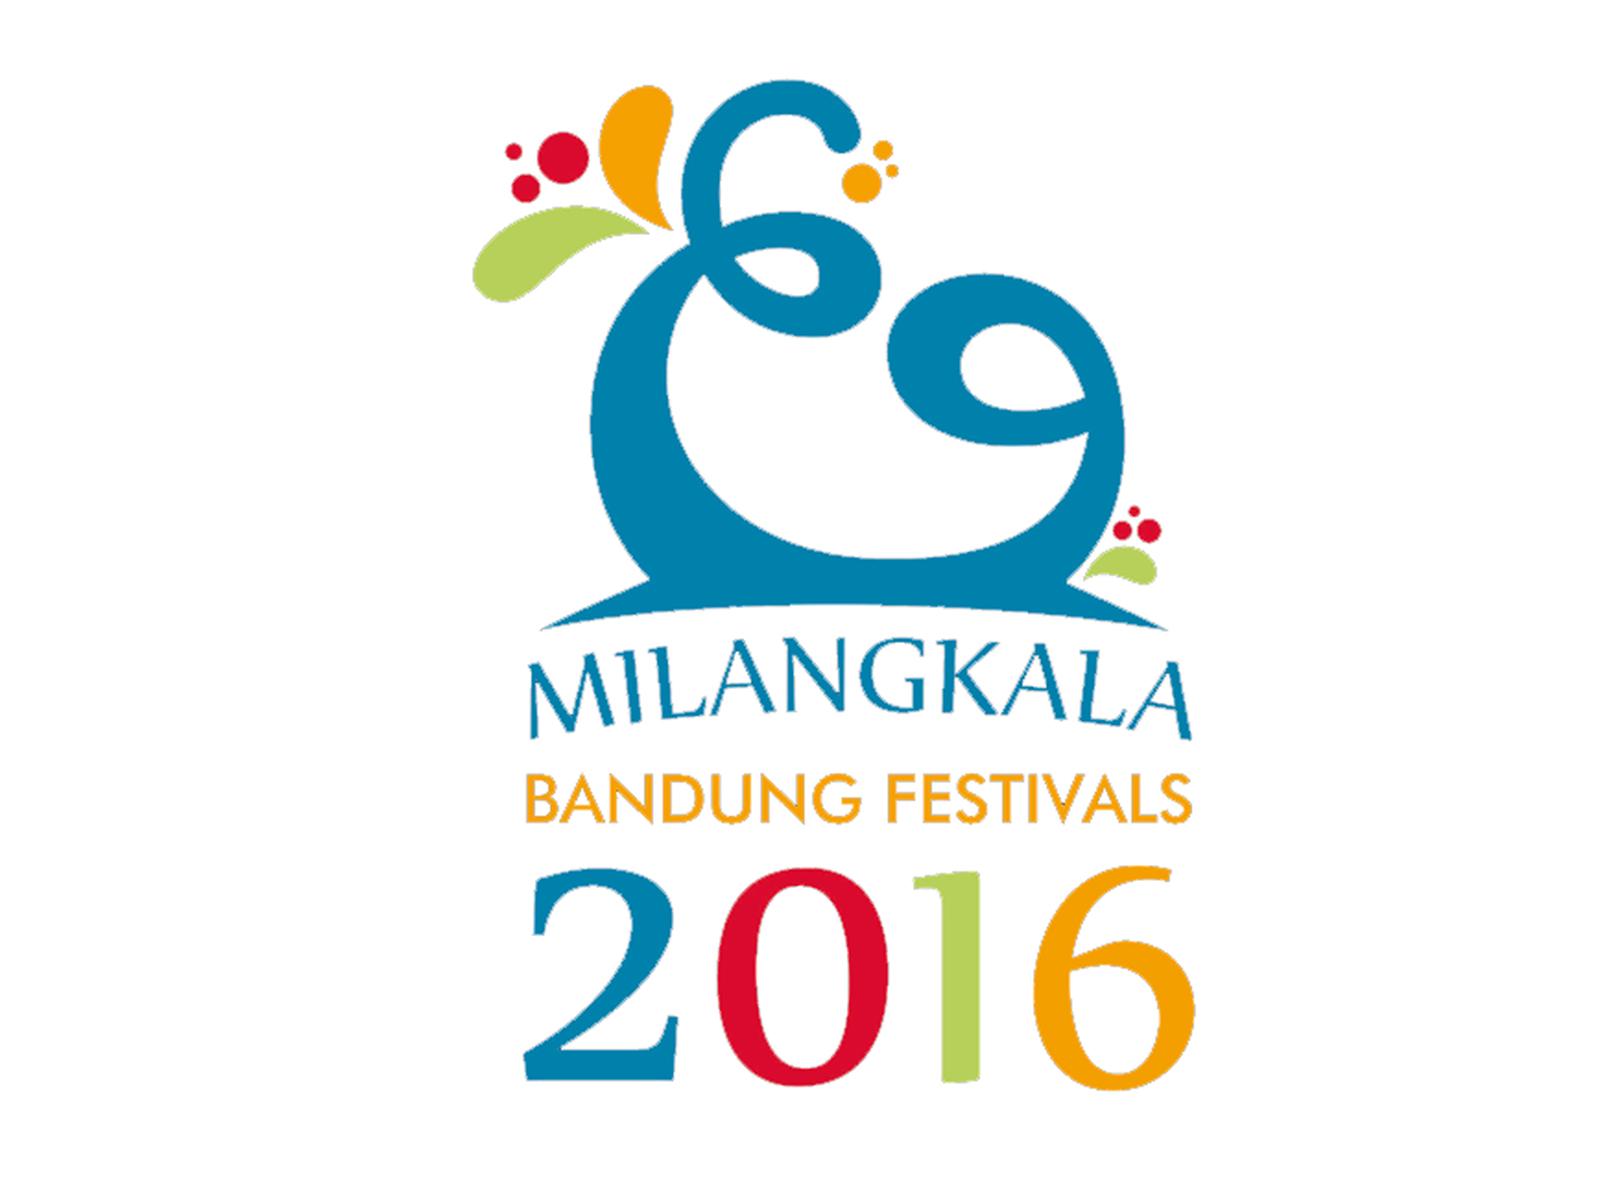 Event-event HUT Bandung ke 206 tahun 2016